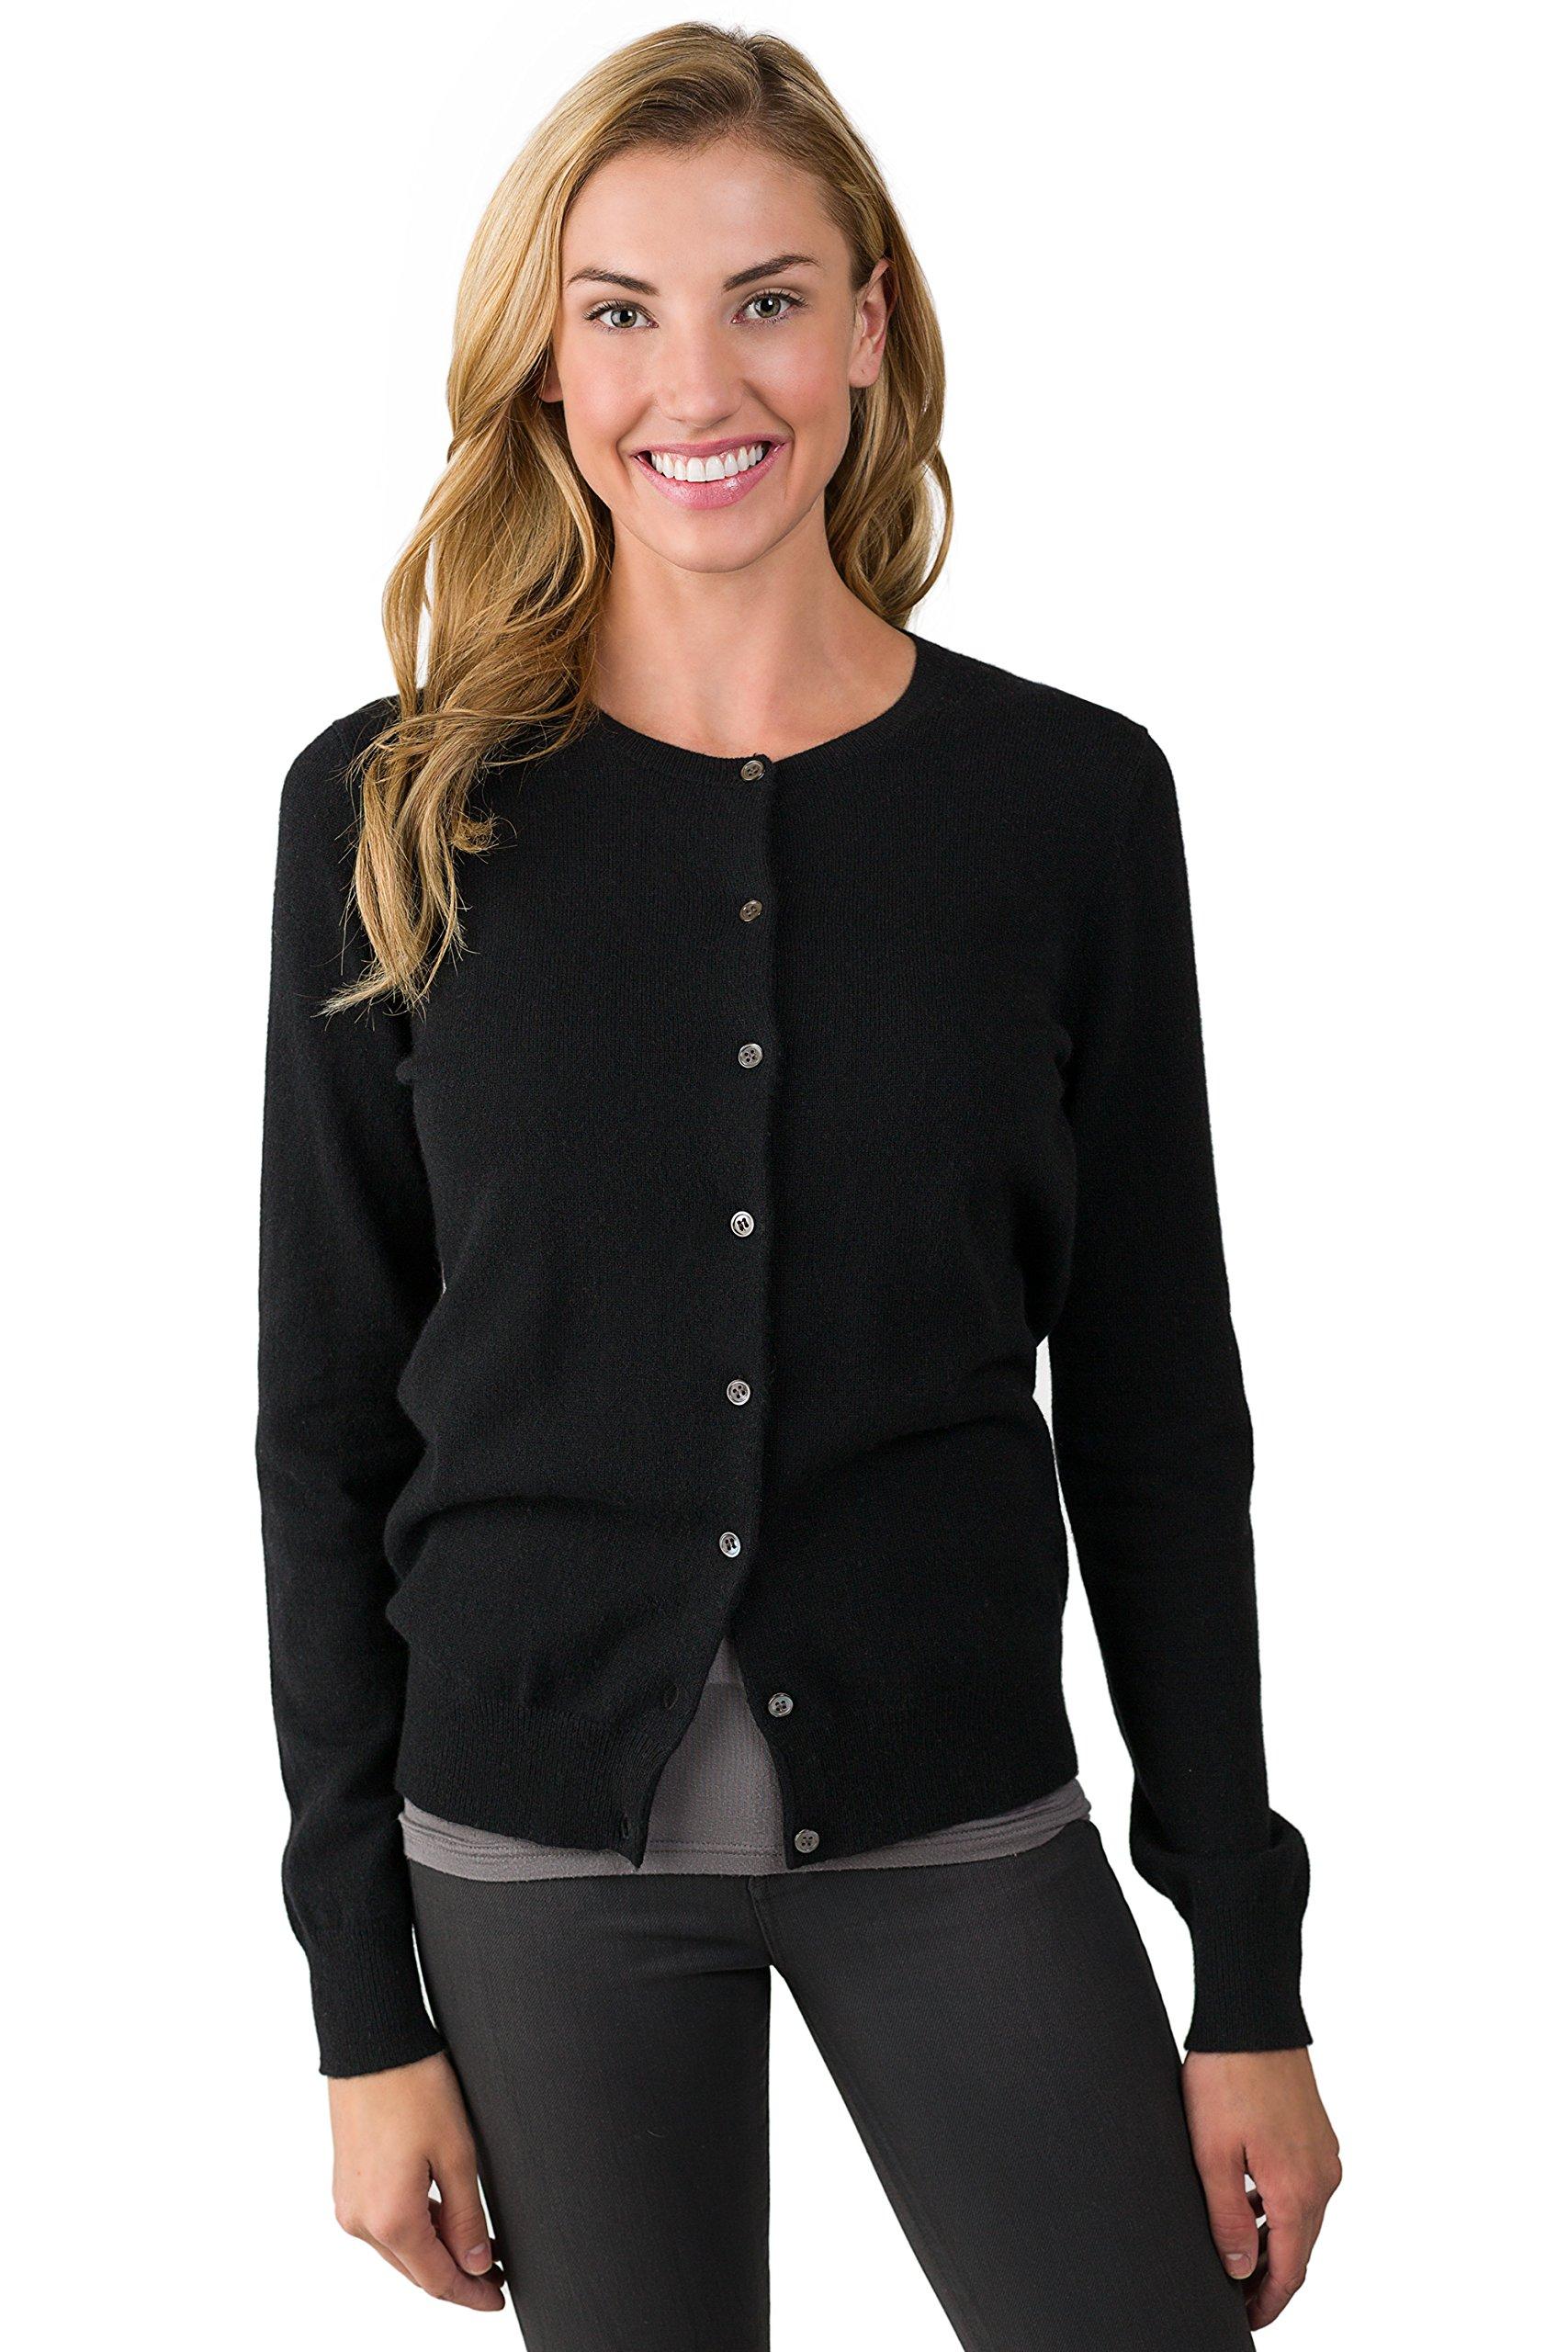 JENNIE LIU Women's 100% Cashmere Button Front Long Sleeve Crewneck Cardigan Sweater (2X, Black)